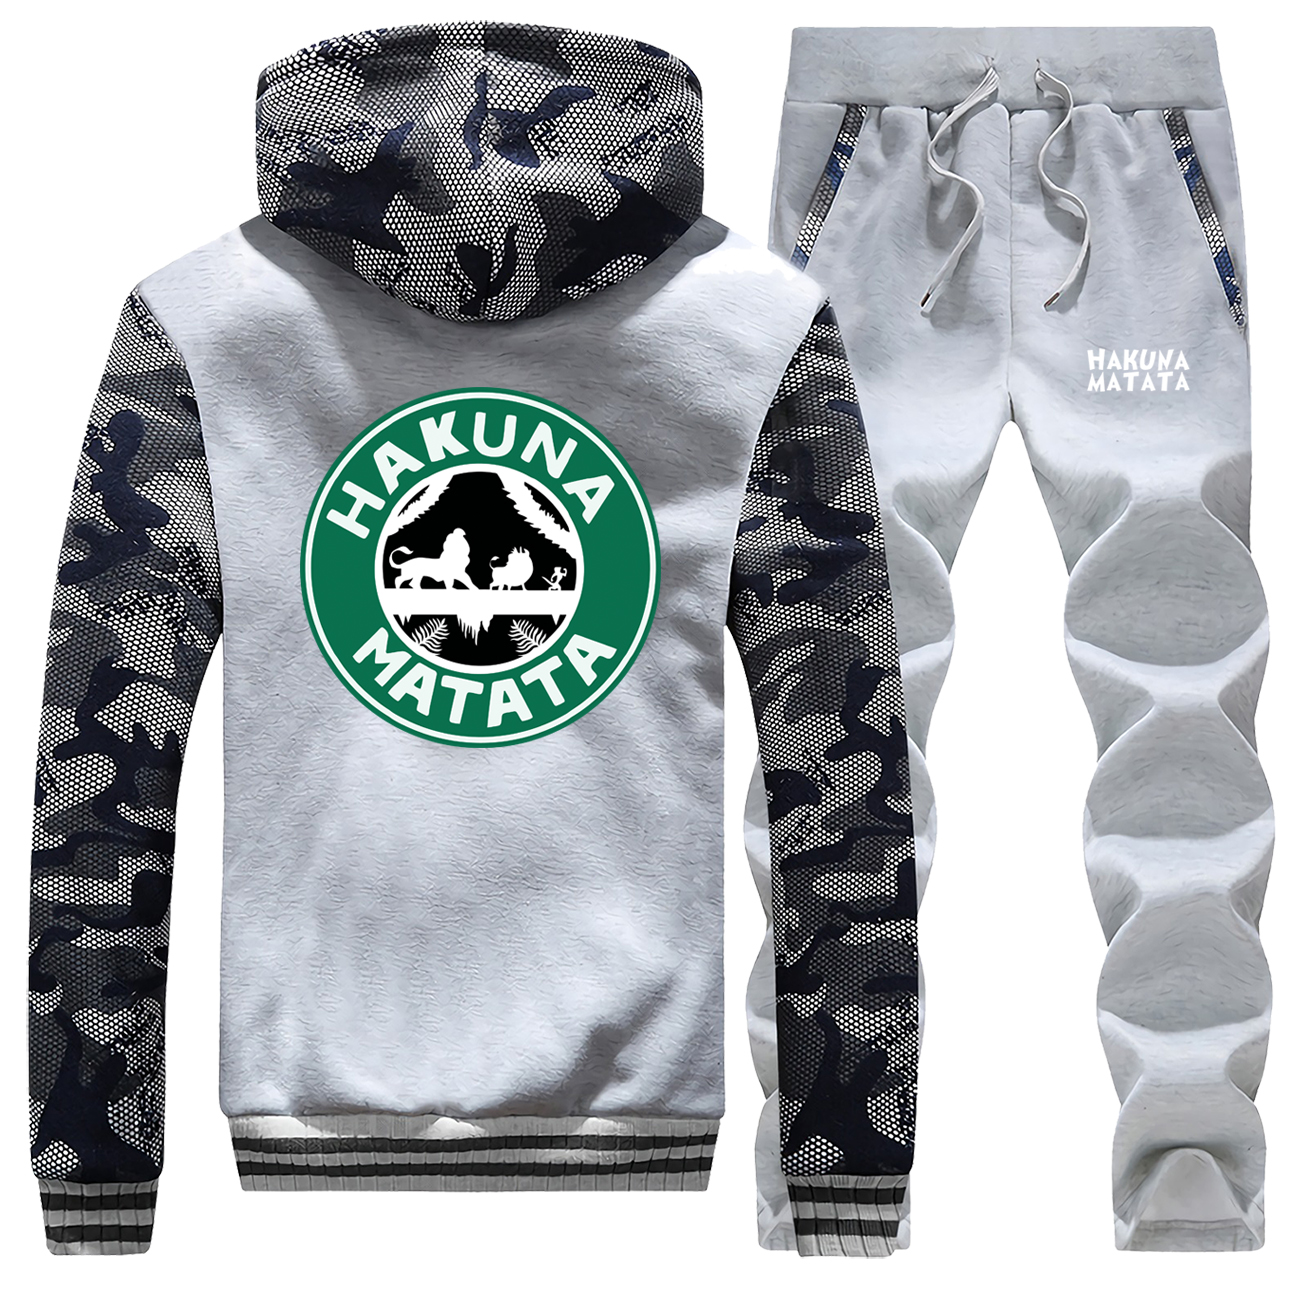 The Lion King Tracksuits Jacket Pant Set Men Hakuna Matata Cartoon Simba Pumbaa Timon Sweatpant Sets Suit 2 PCS Coat Sportswear